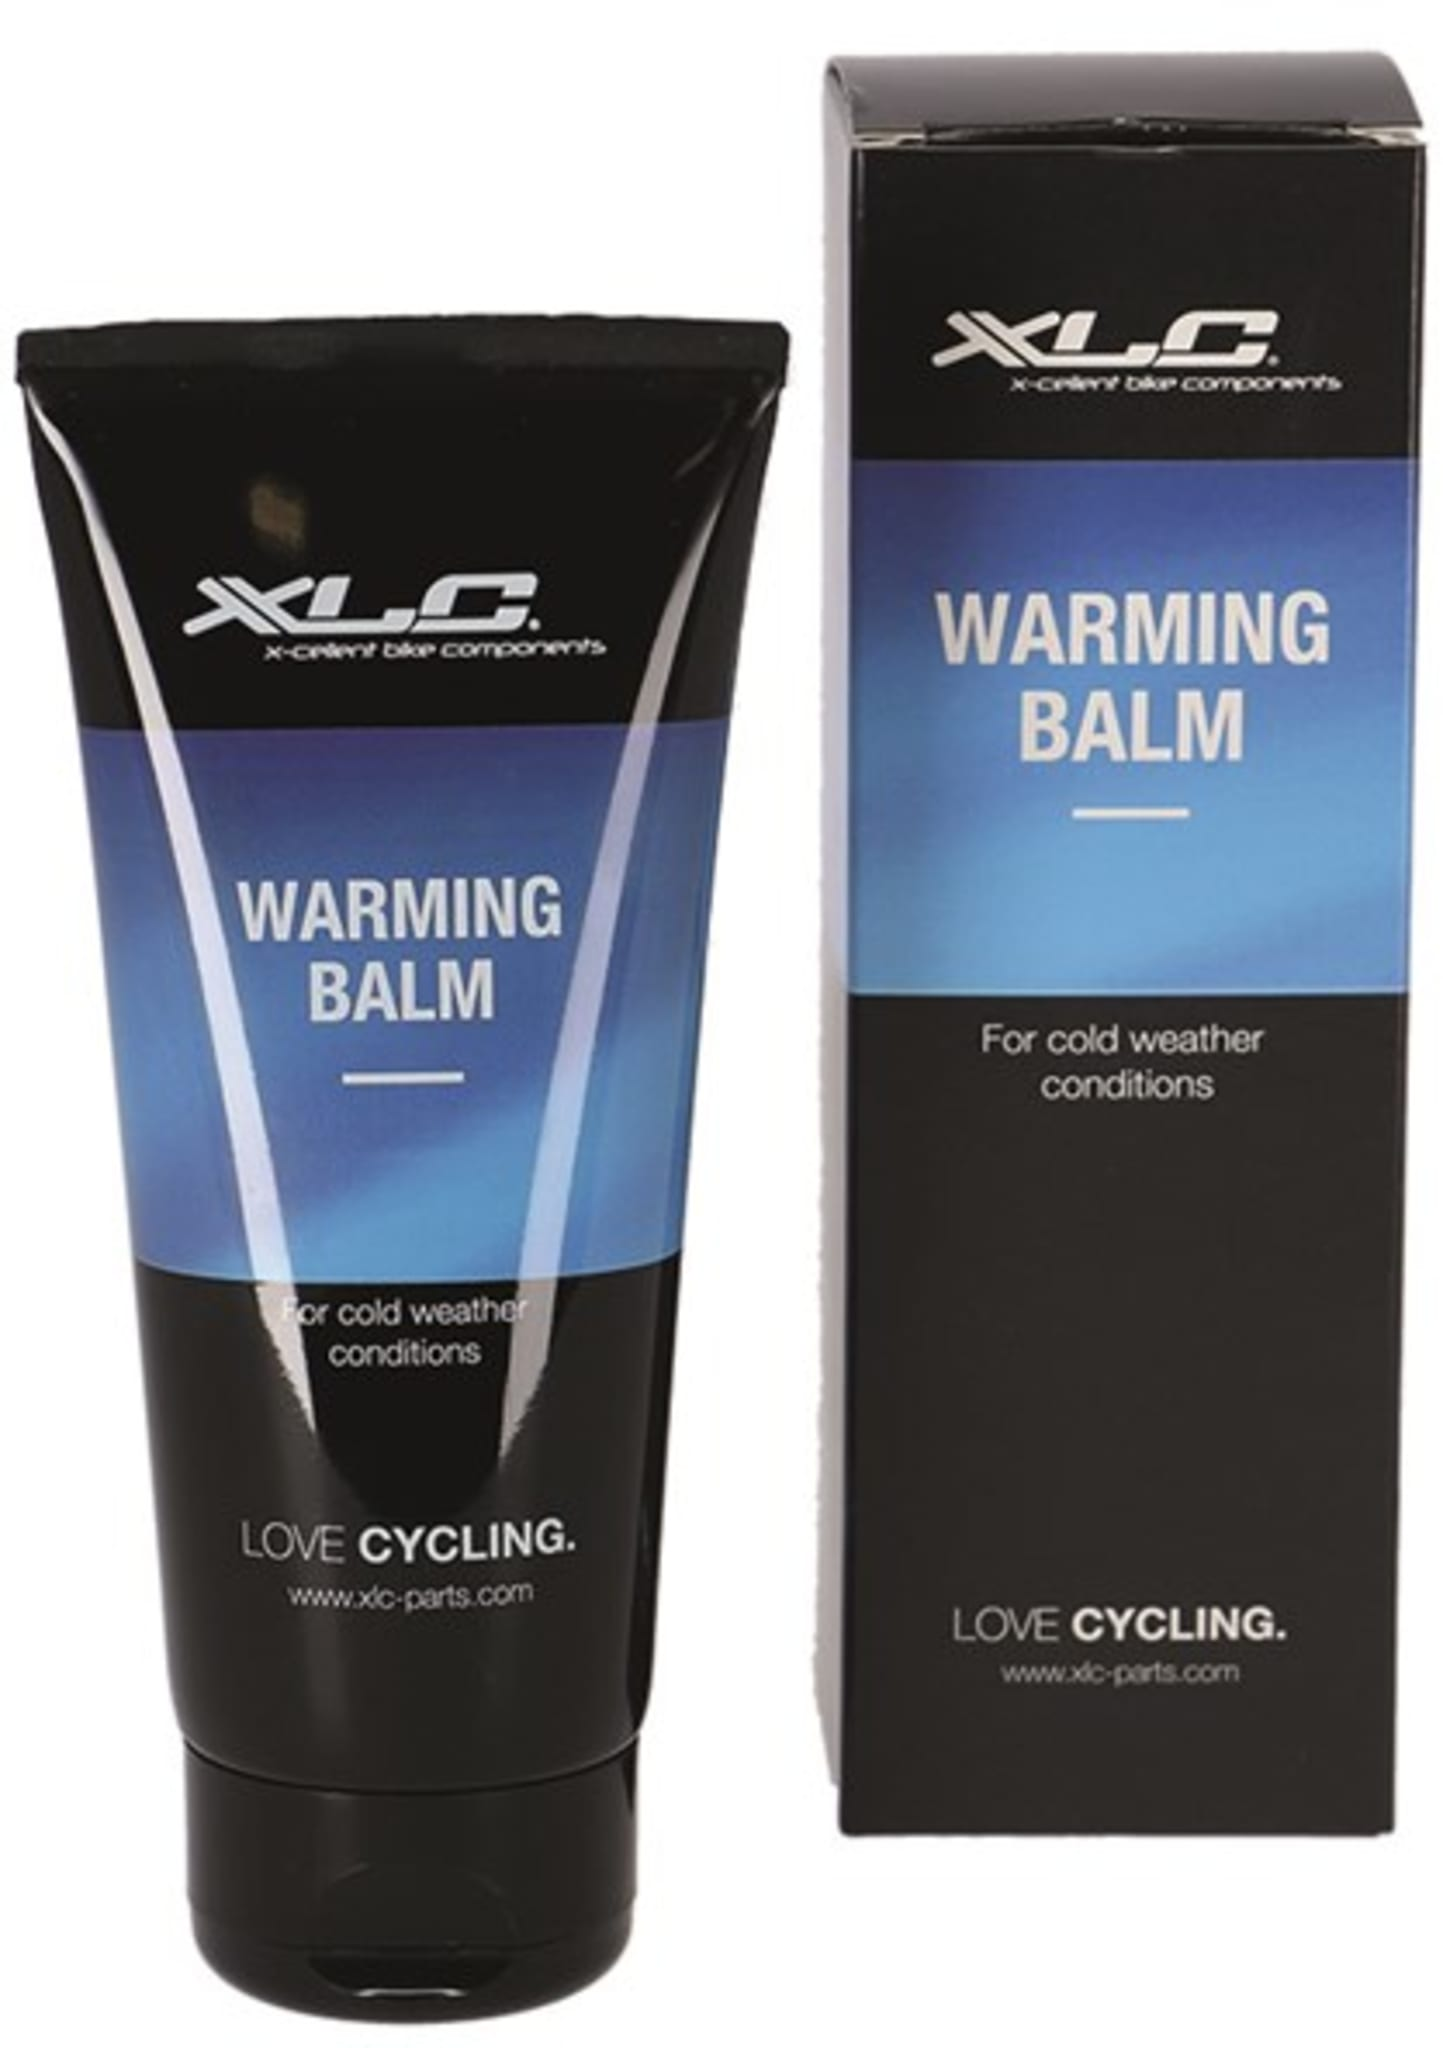 XLC Warming Balm